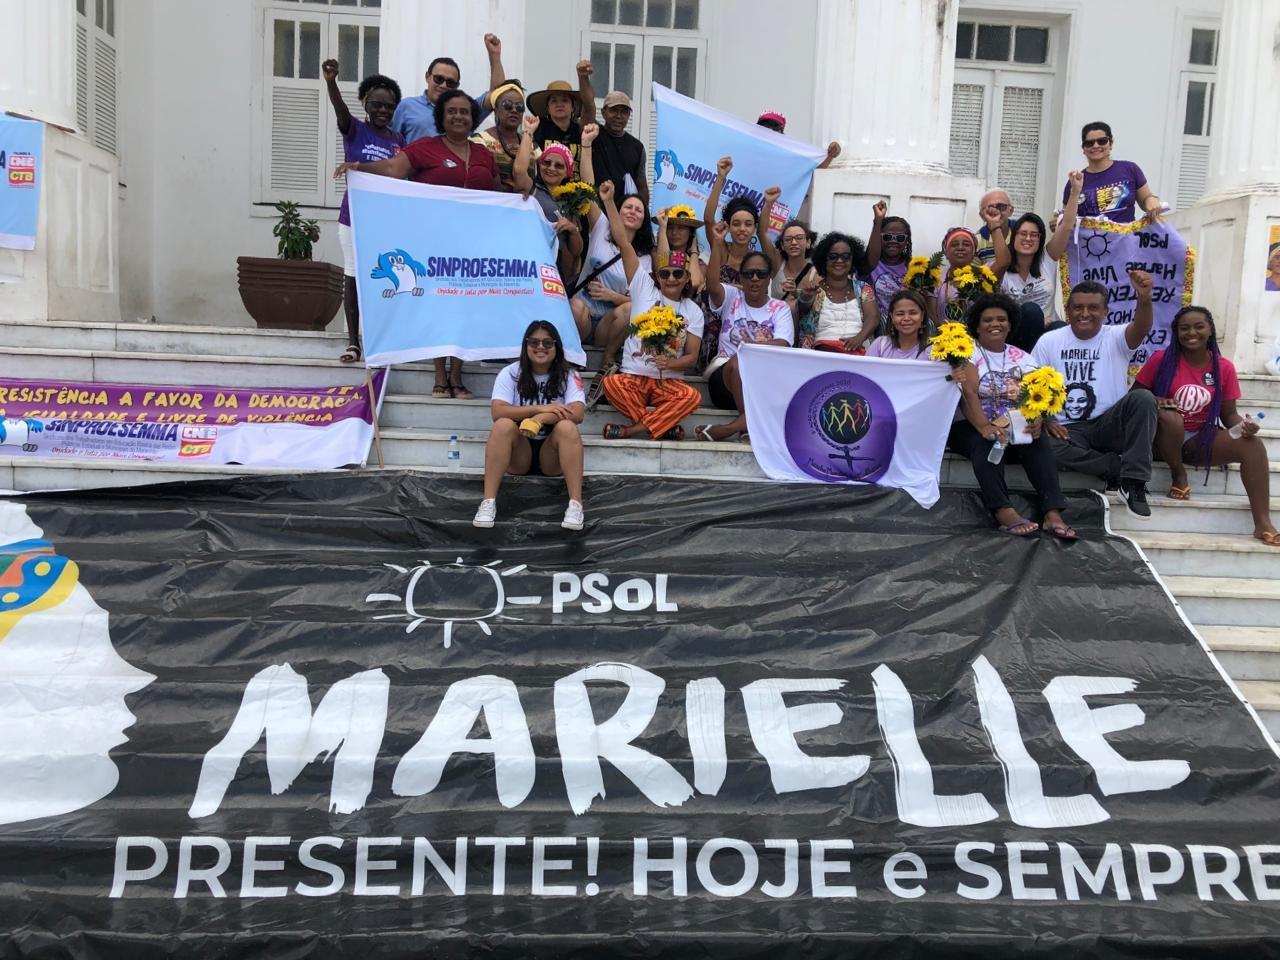 Sindoméstico do MA participa de ato pelos dois anos de morte de Marielle Franco e Anderson Gomes